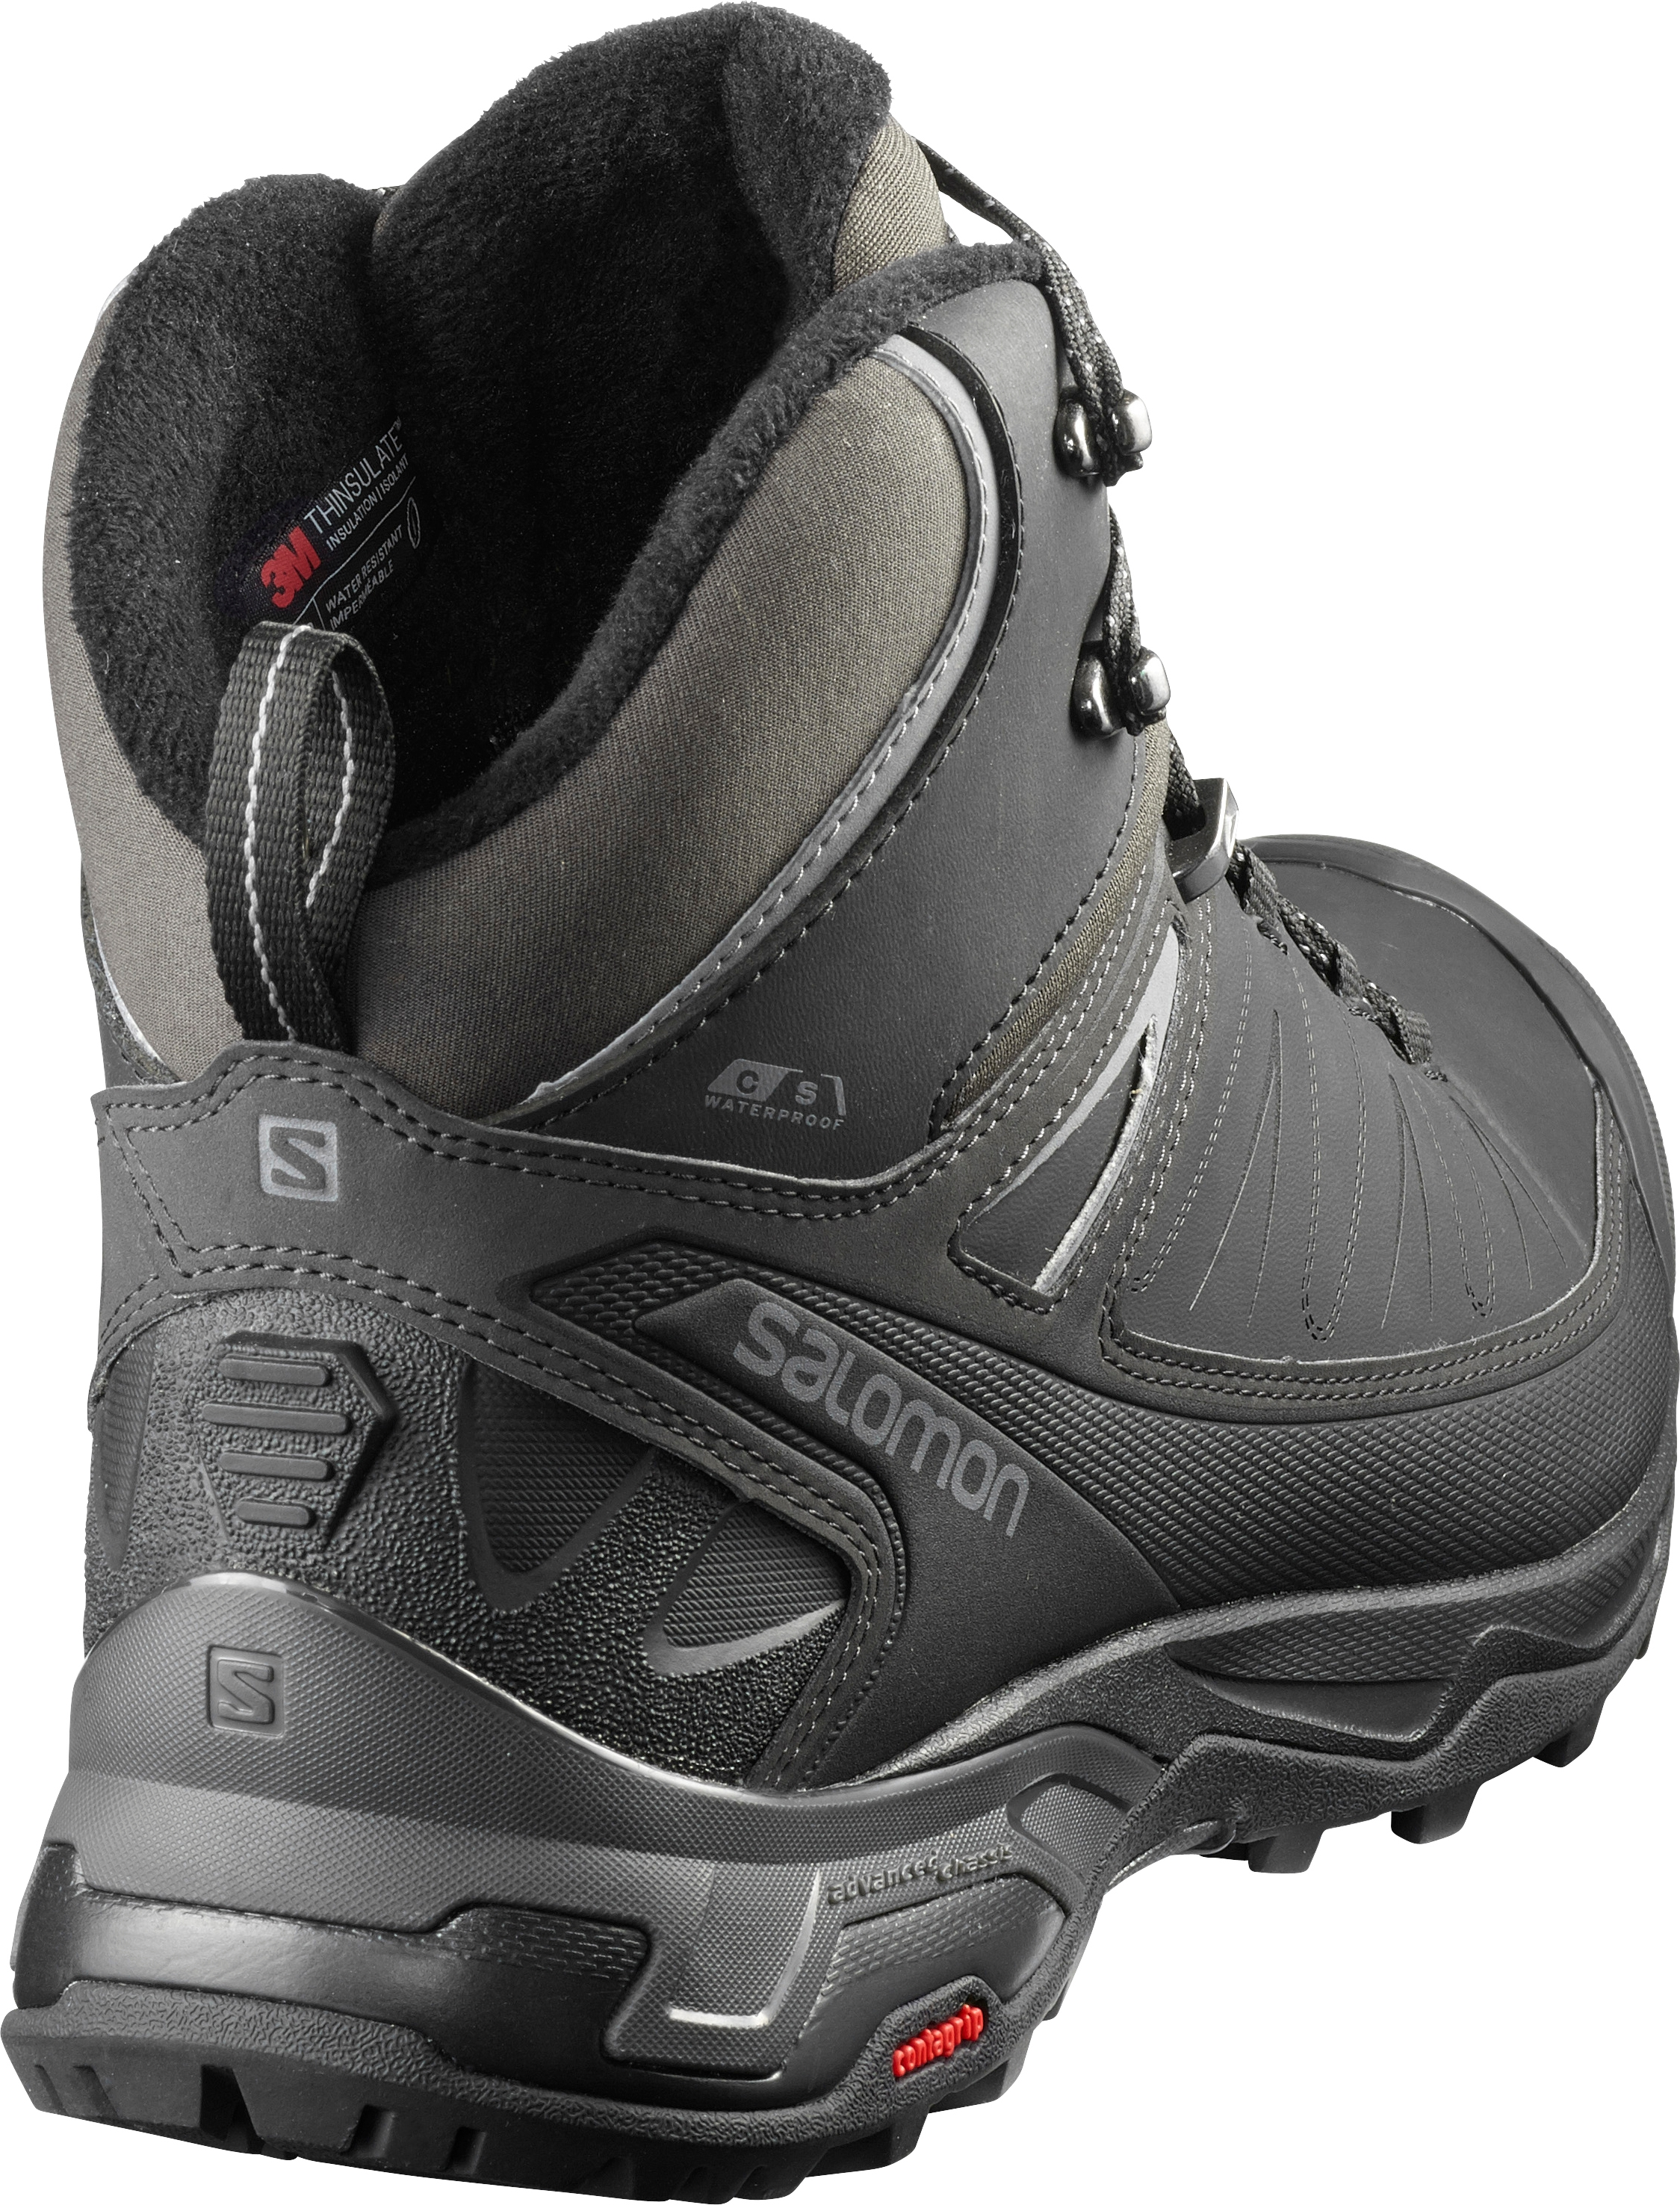 Salomon X ULTRA MID WINTER CS WP Shoe 2020 blackphantom